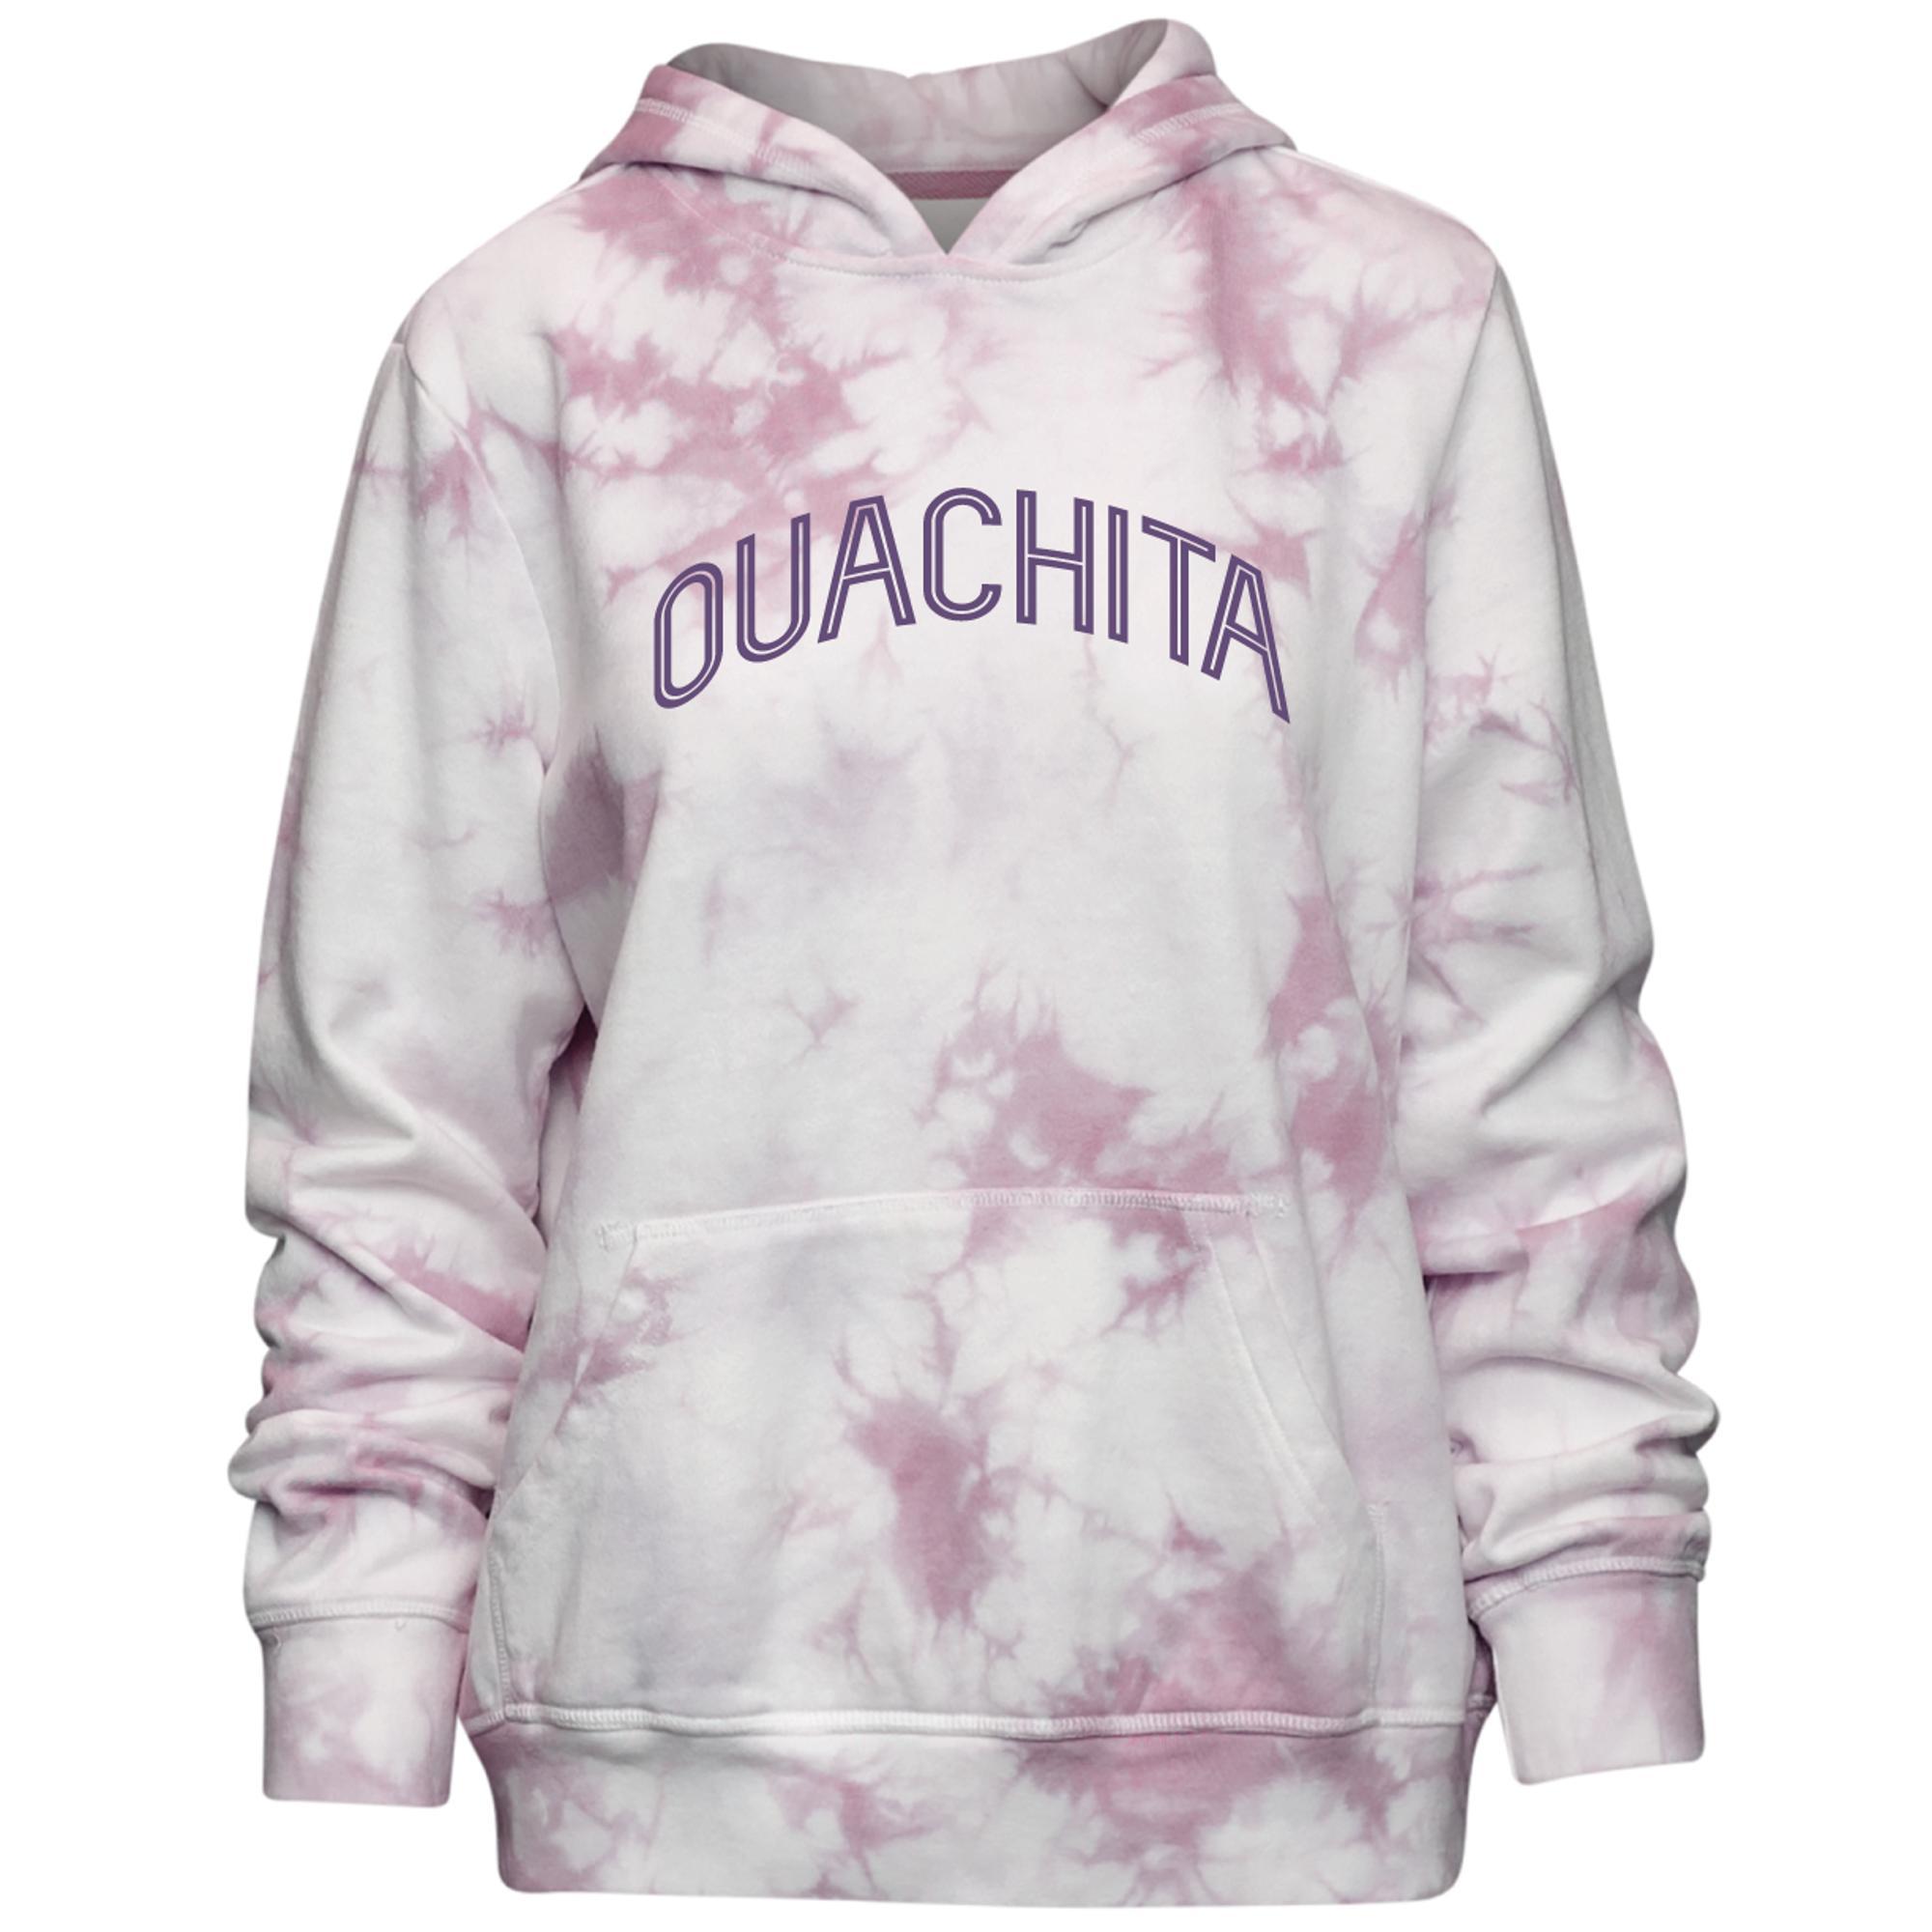 image of: Ouachita Starburst Hoodie